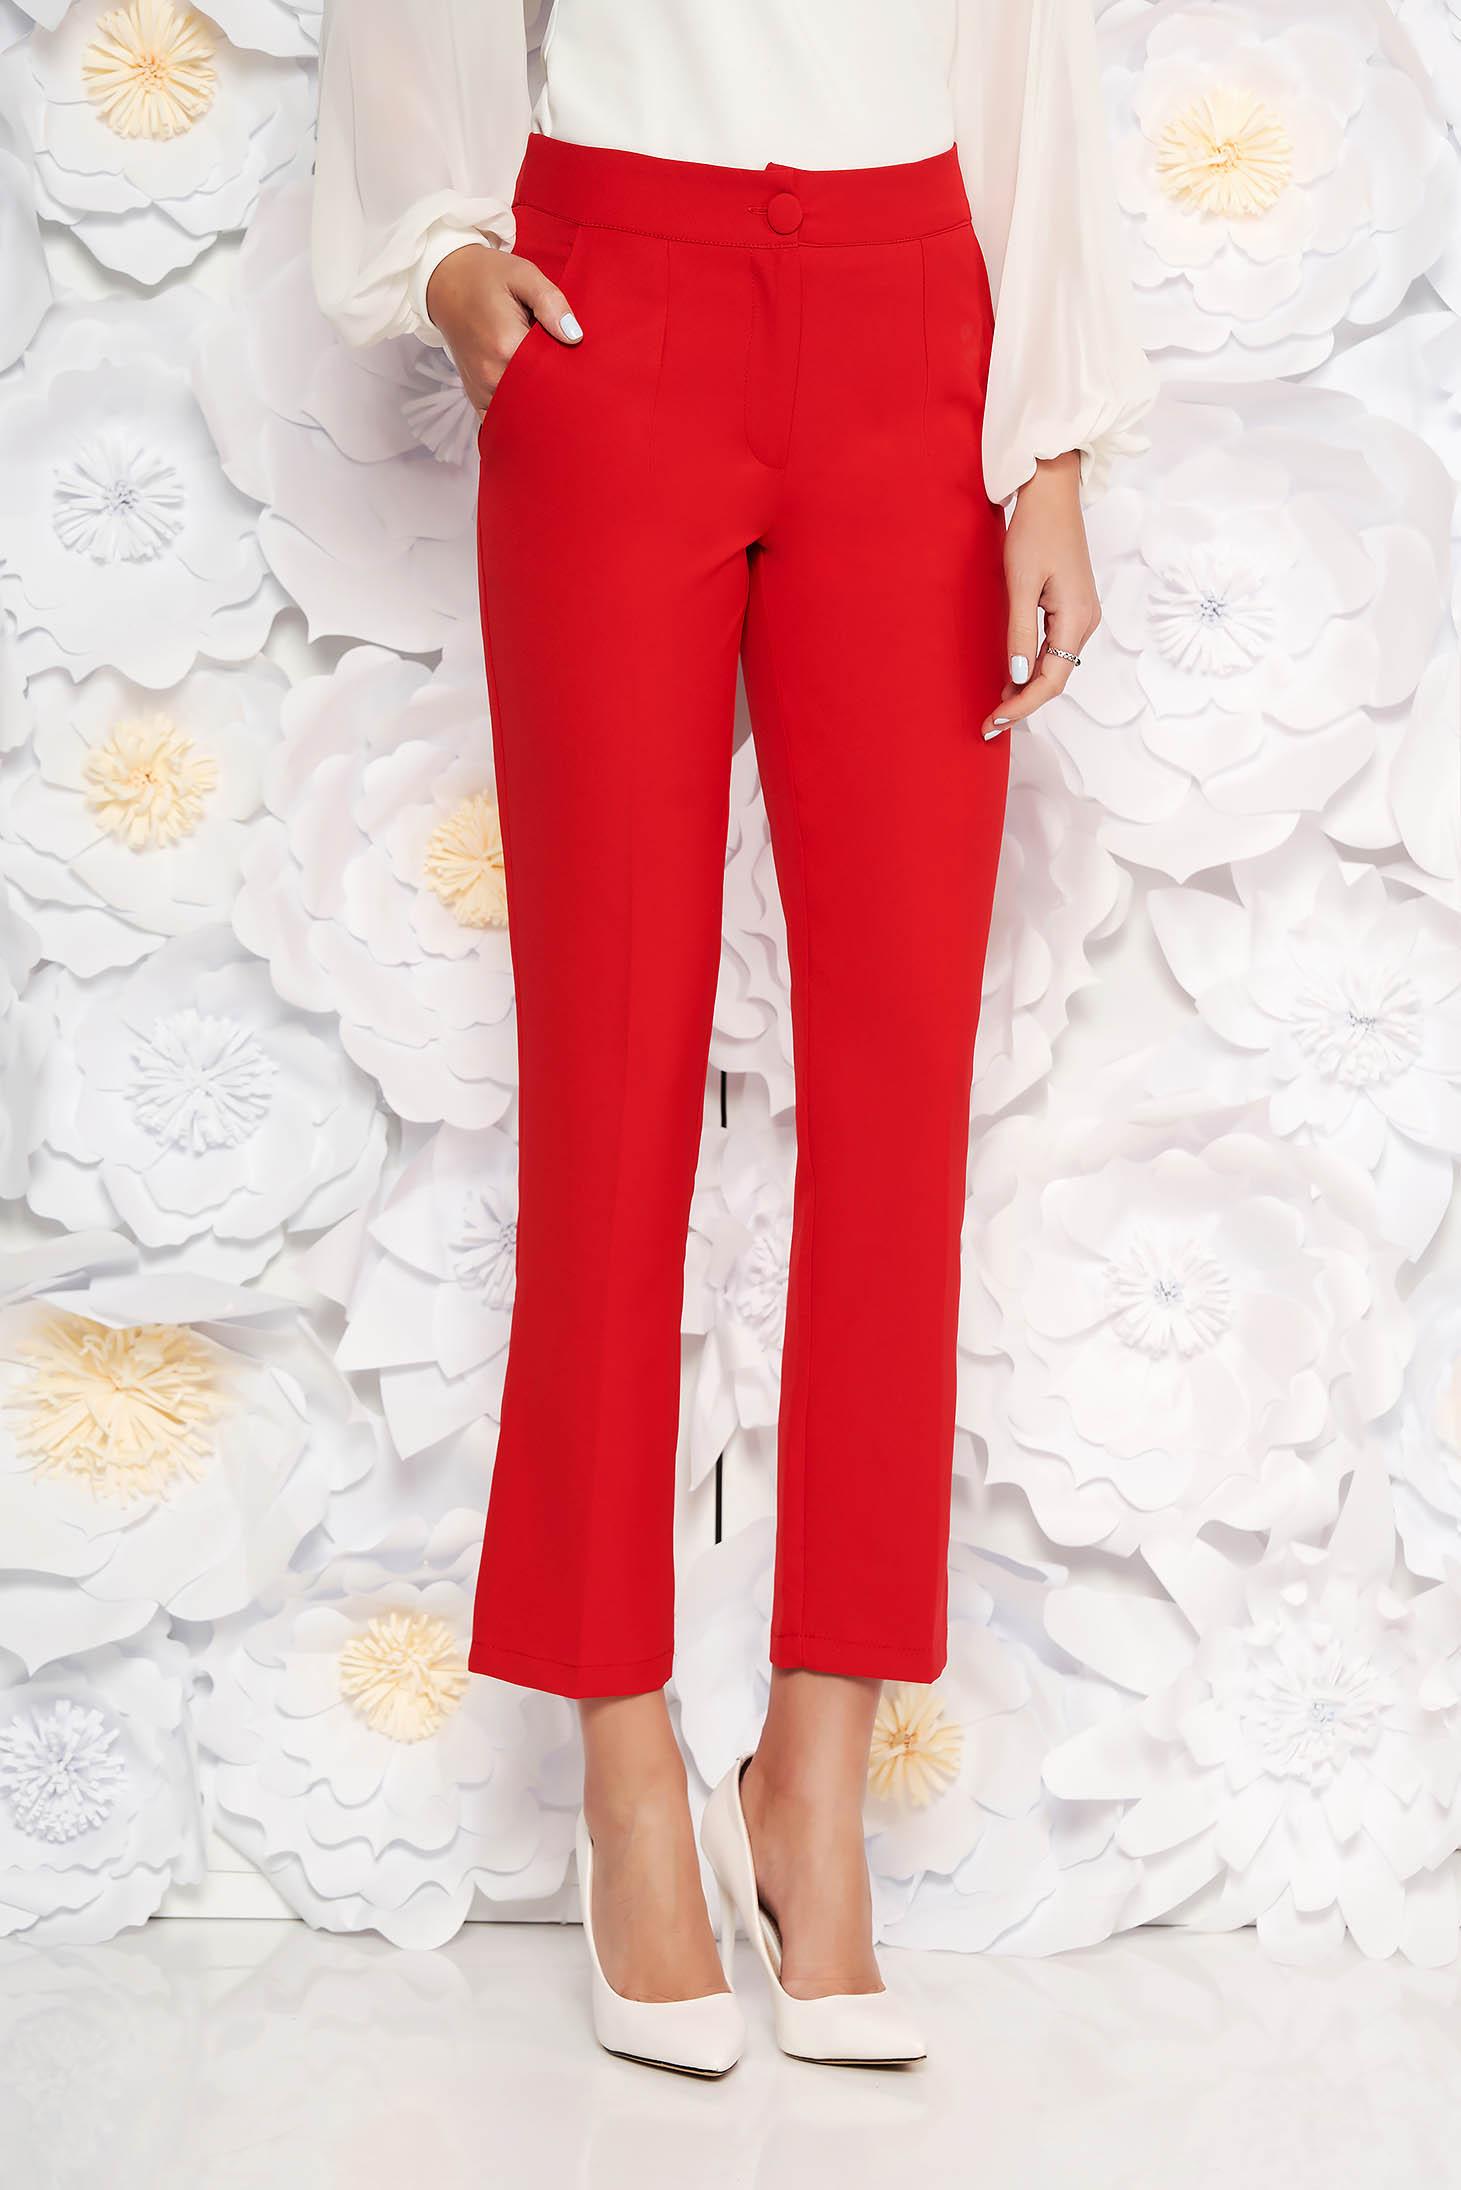 Pantaloni Artista rosii office cu un croi drept cu talie medie din stofa usor elastica cu buzunare